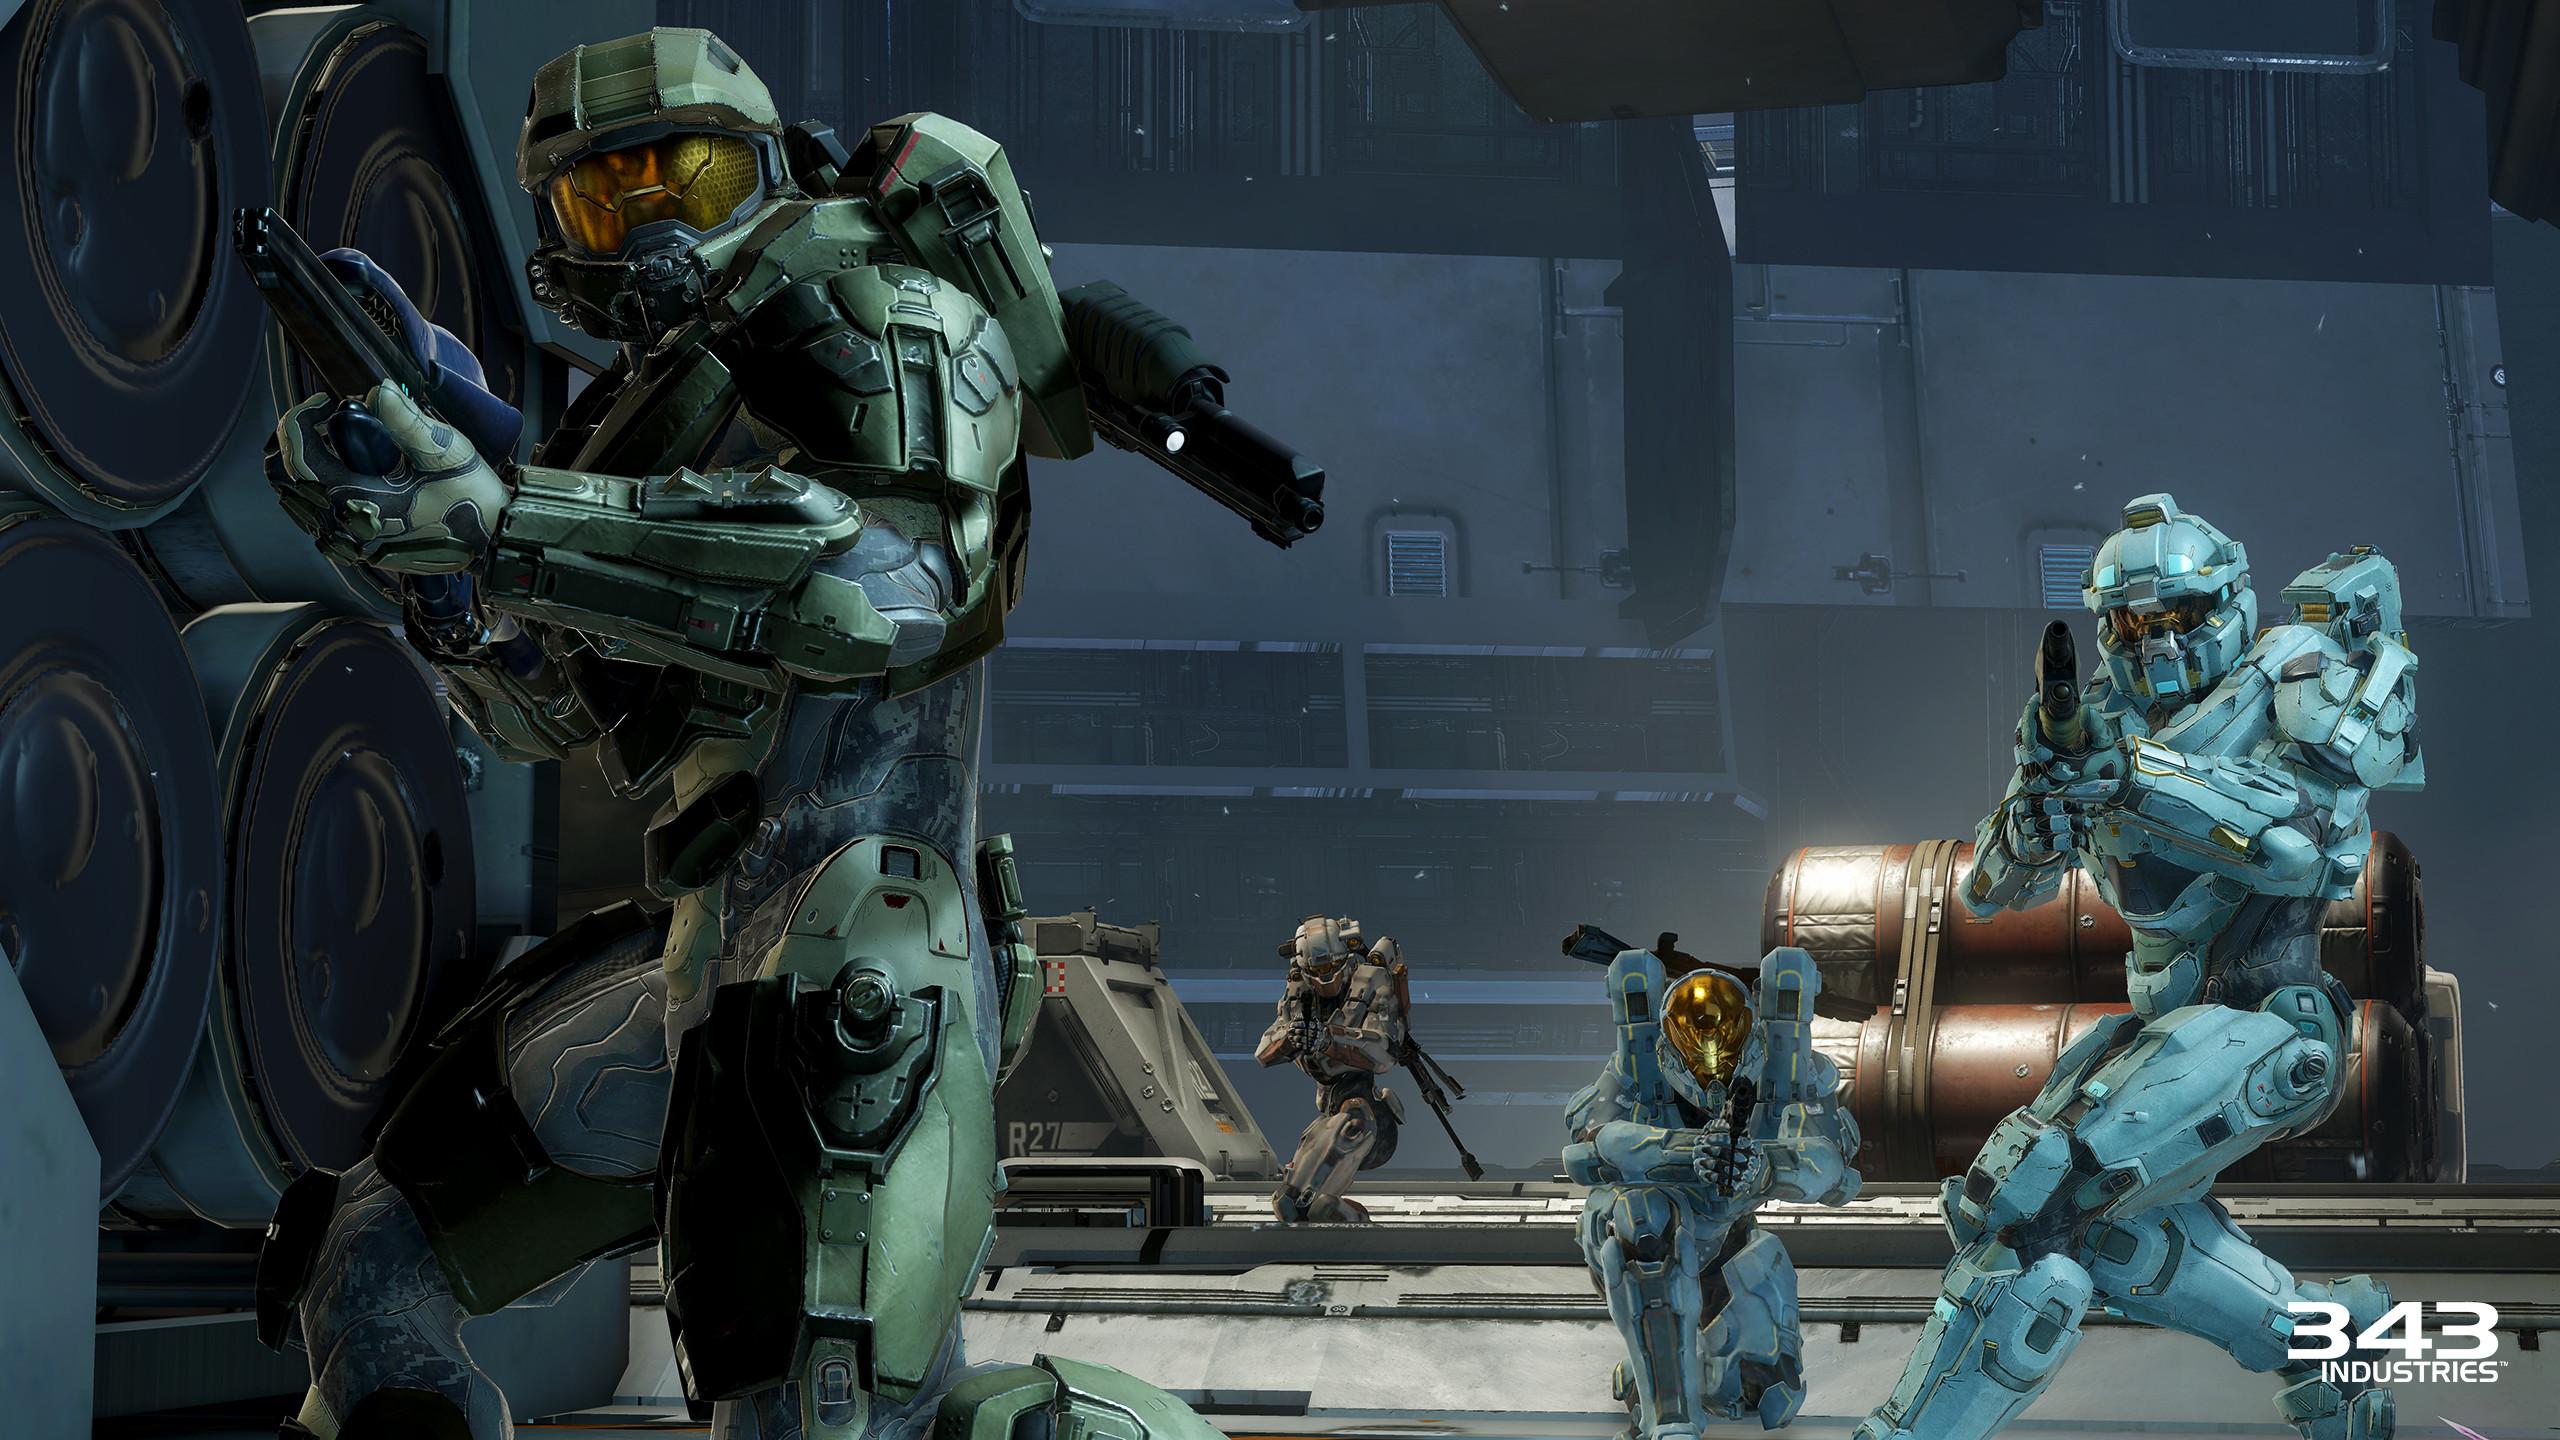 H5-Guardians-Blue-Team-Bounding-Overwatch-jpg